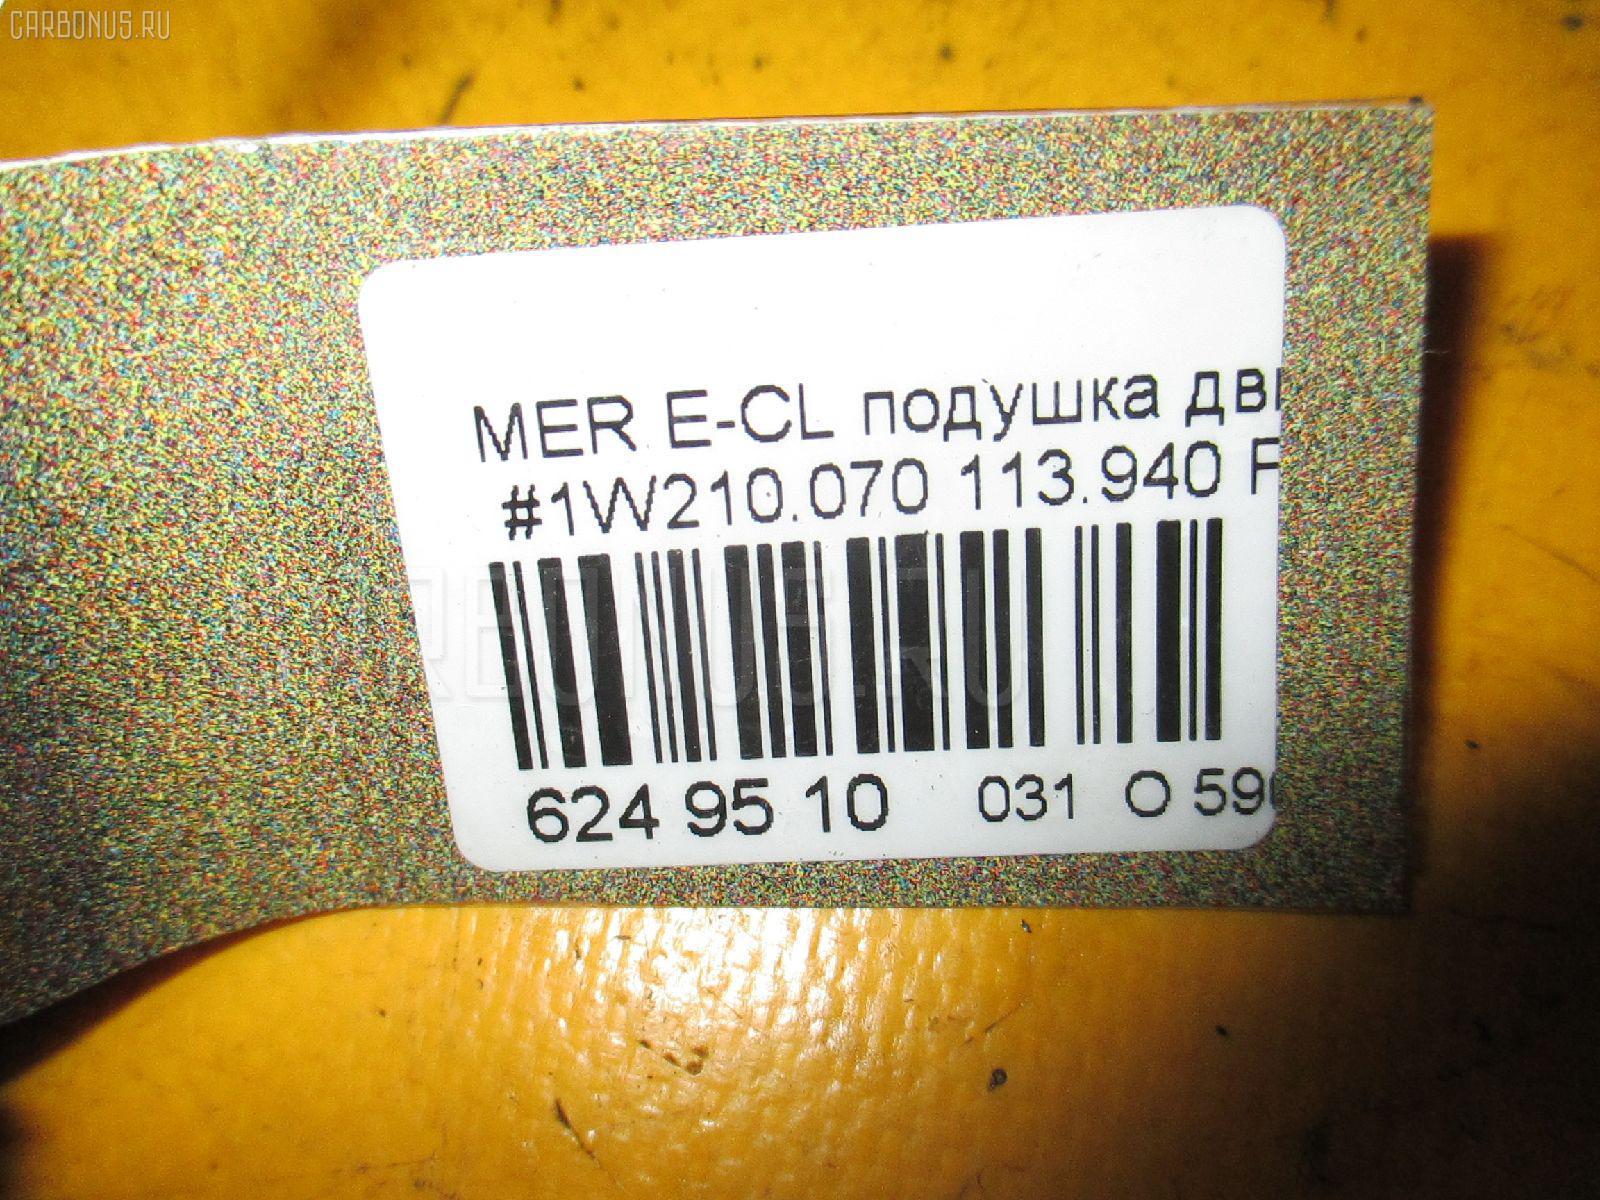 Подушка двигателя MERCEDES-BENZ E-CLASS W210.070 113.940 Фото 3